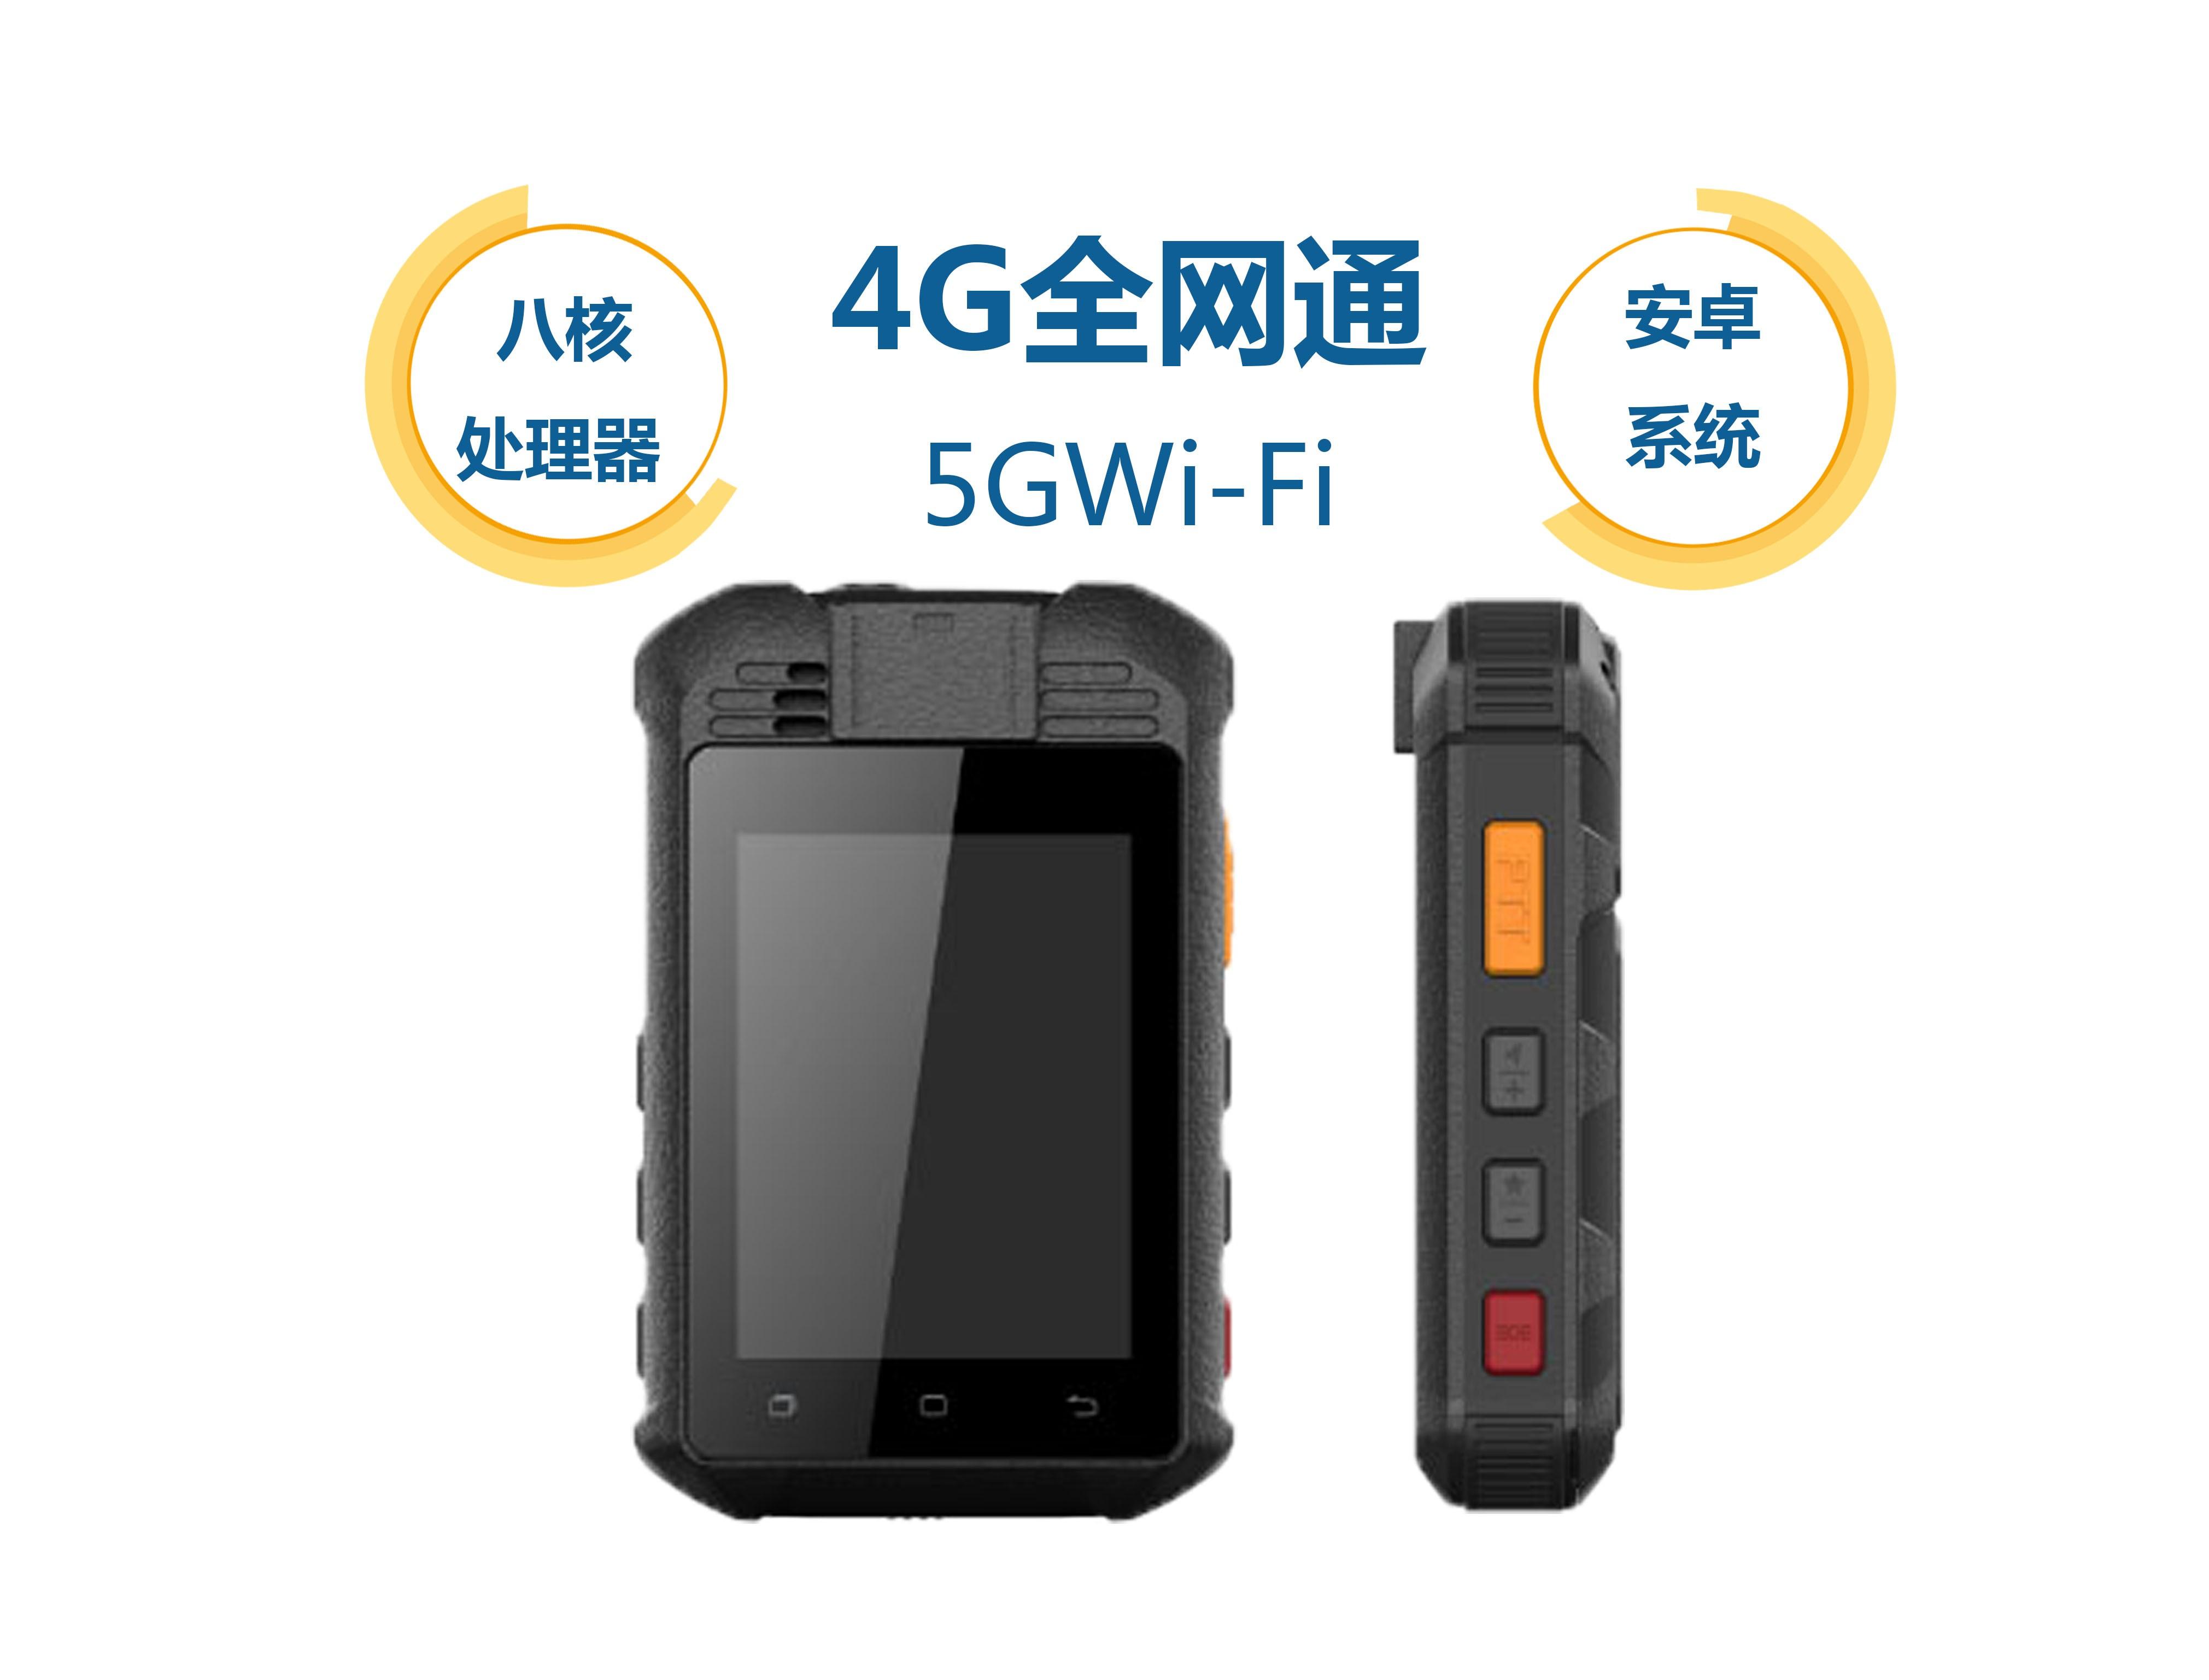 4G执法记录仪.jpg